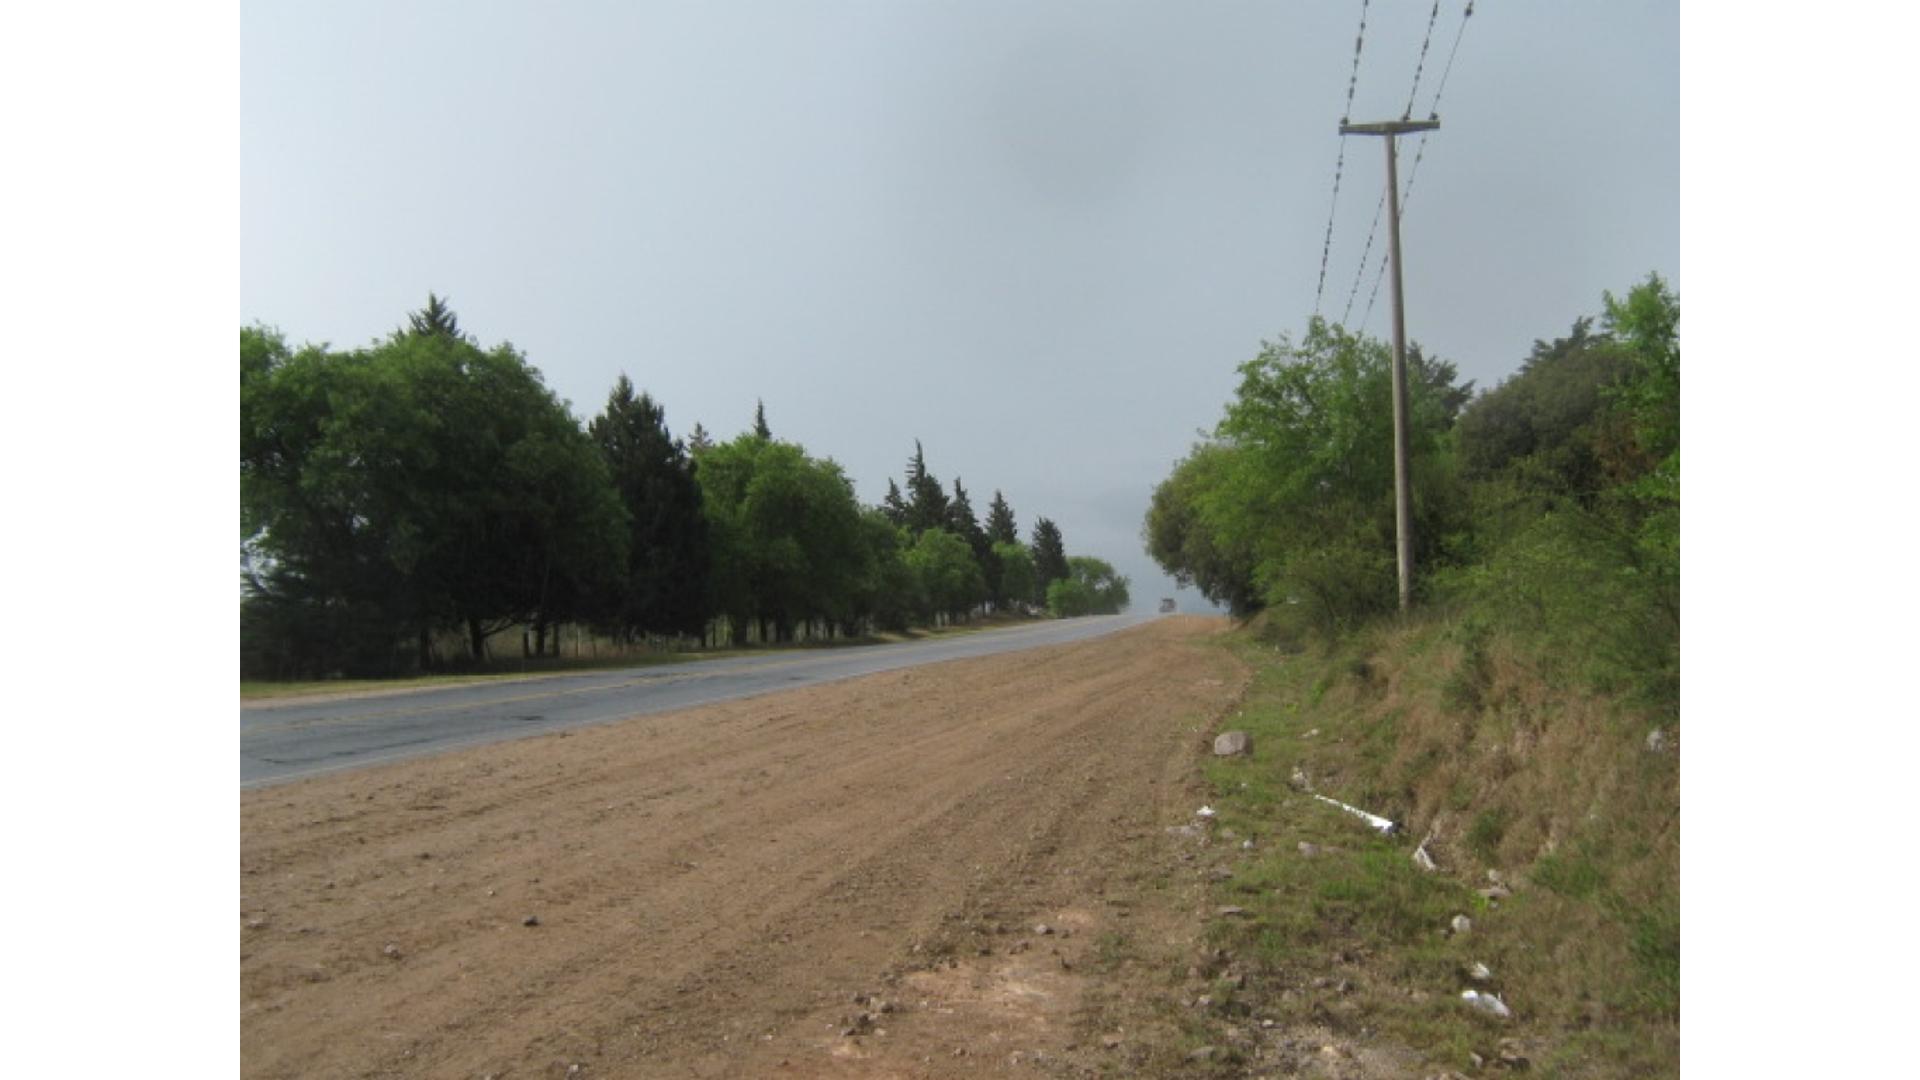 Ruta 38 100 - $ 300.000 - Terreno en Venta